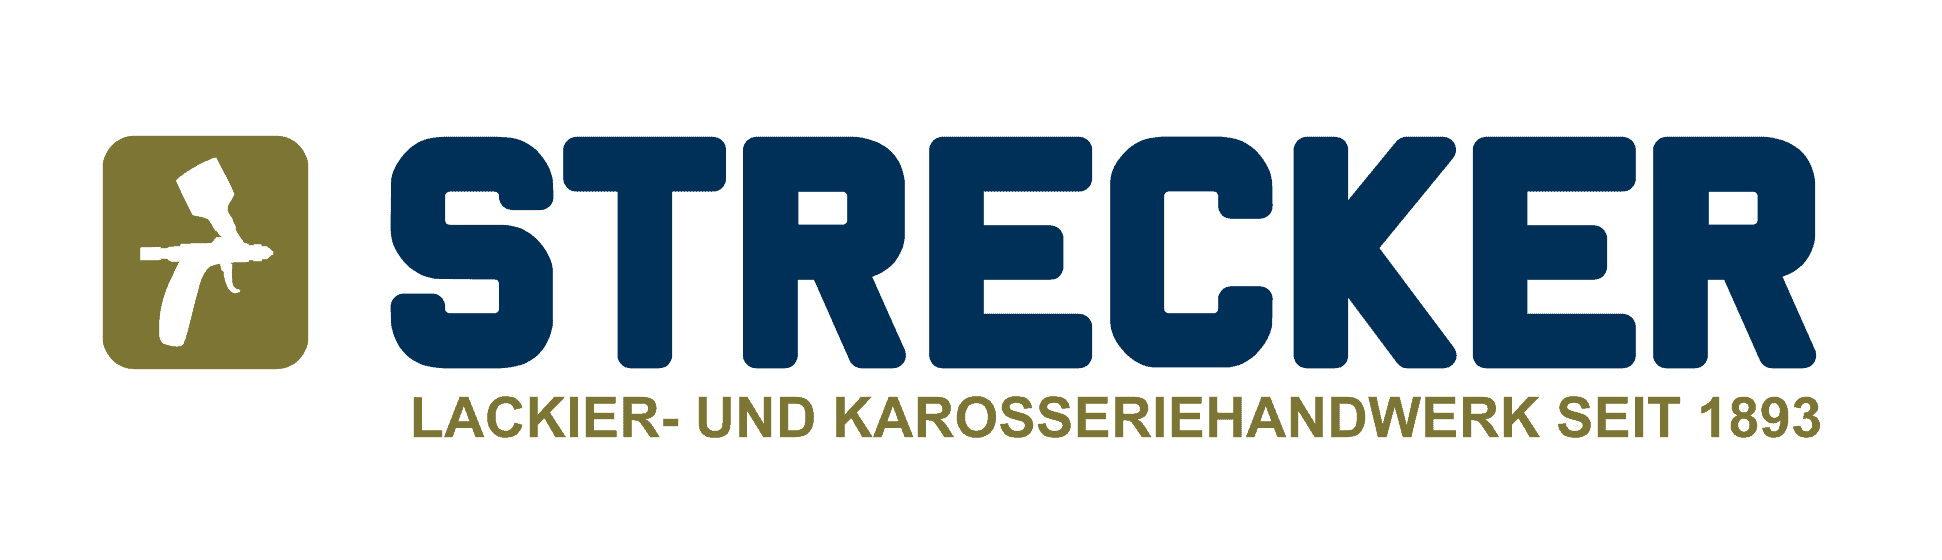 strecker-dortmund.de